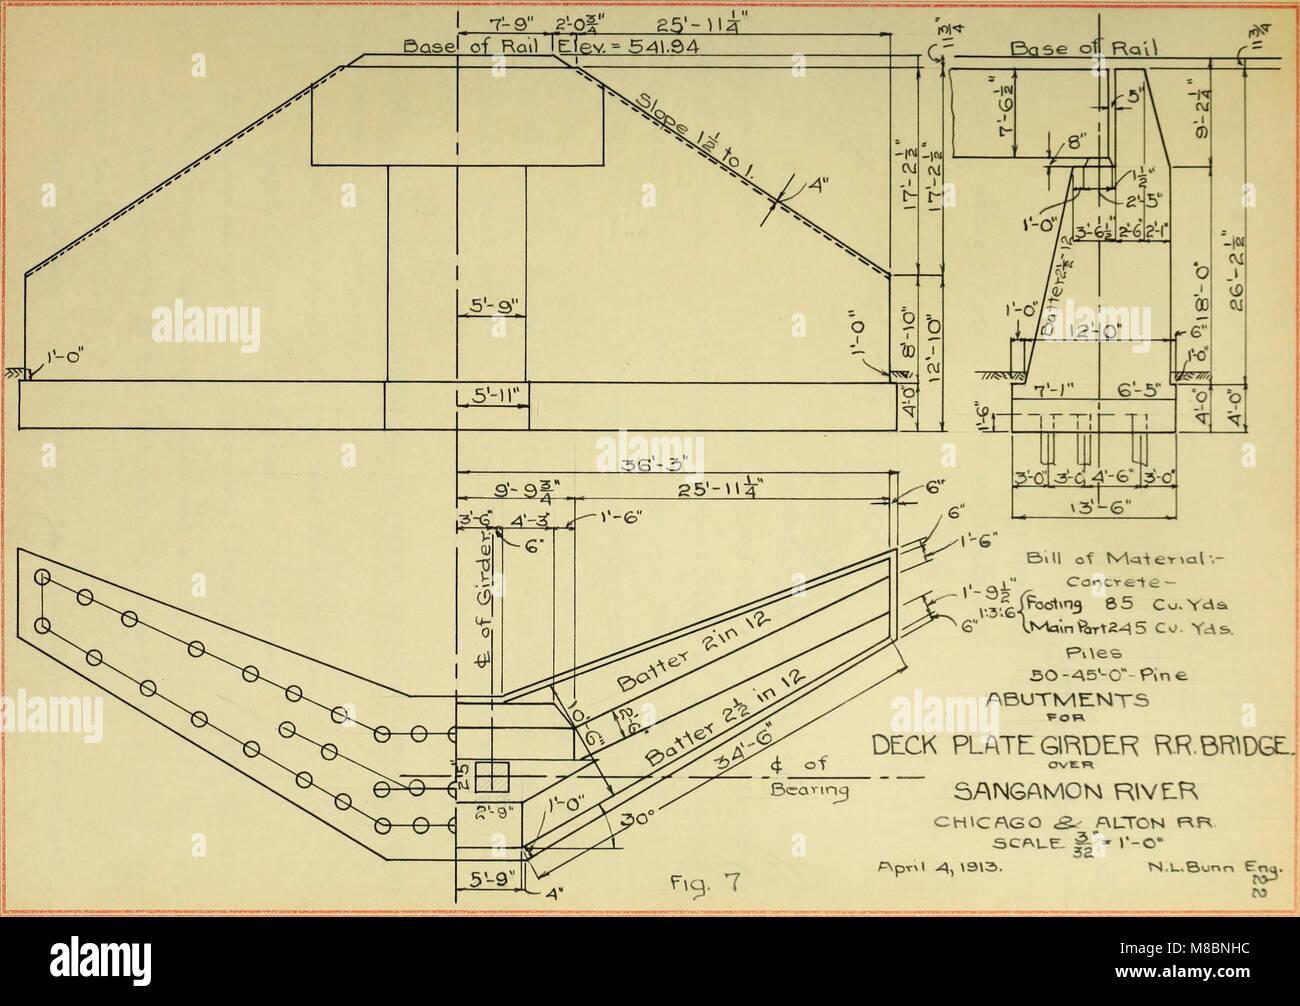 Plate Girder Bridge Stock Photos Images Beam Diagram Of The Design Concept A Railroad 1913 14574185110